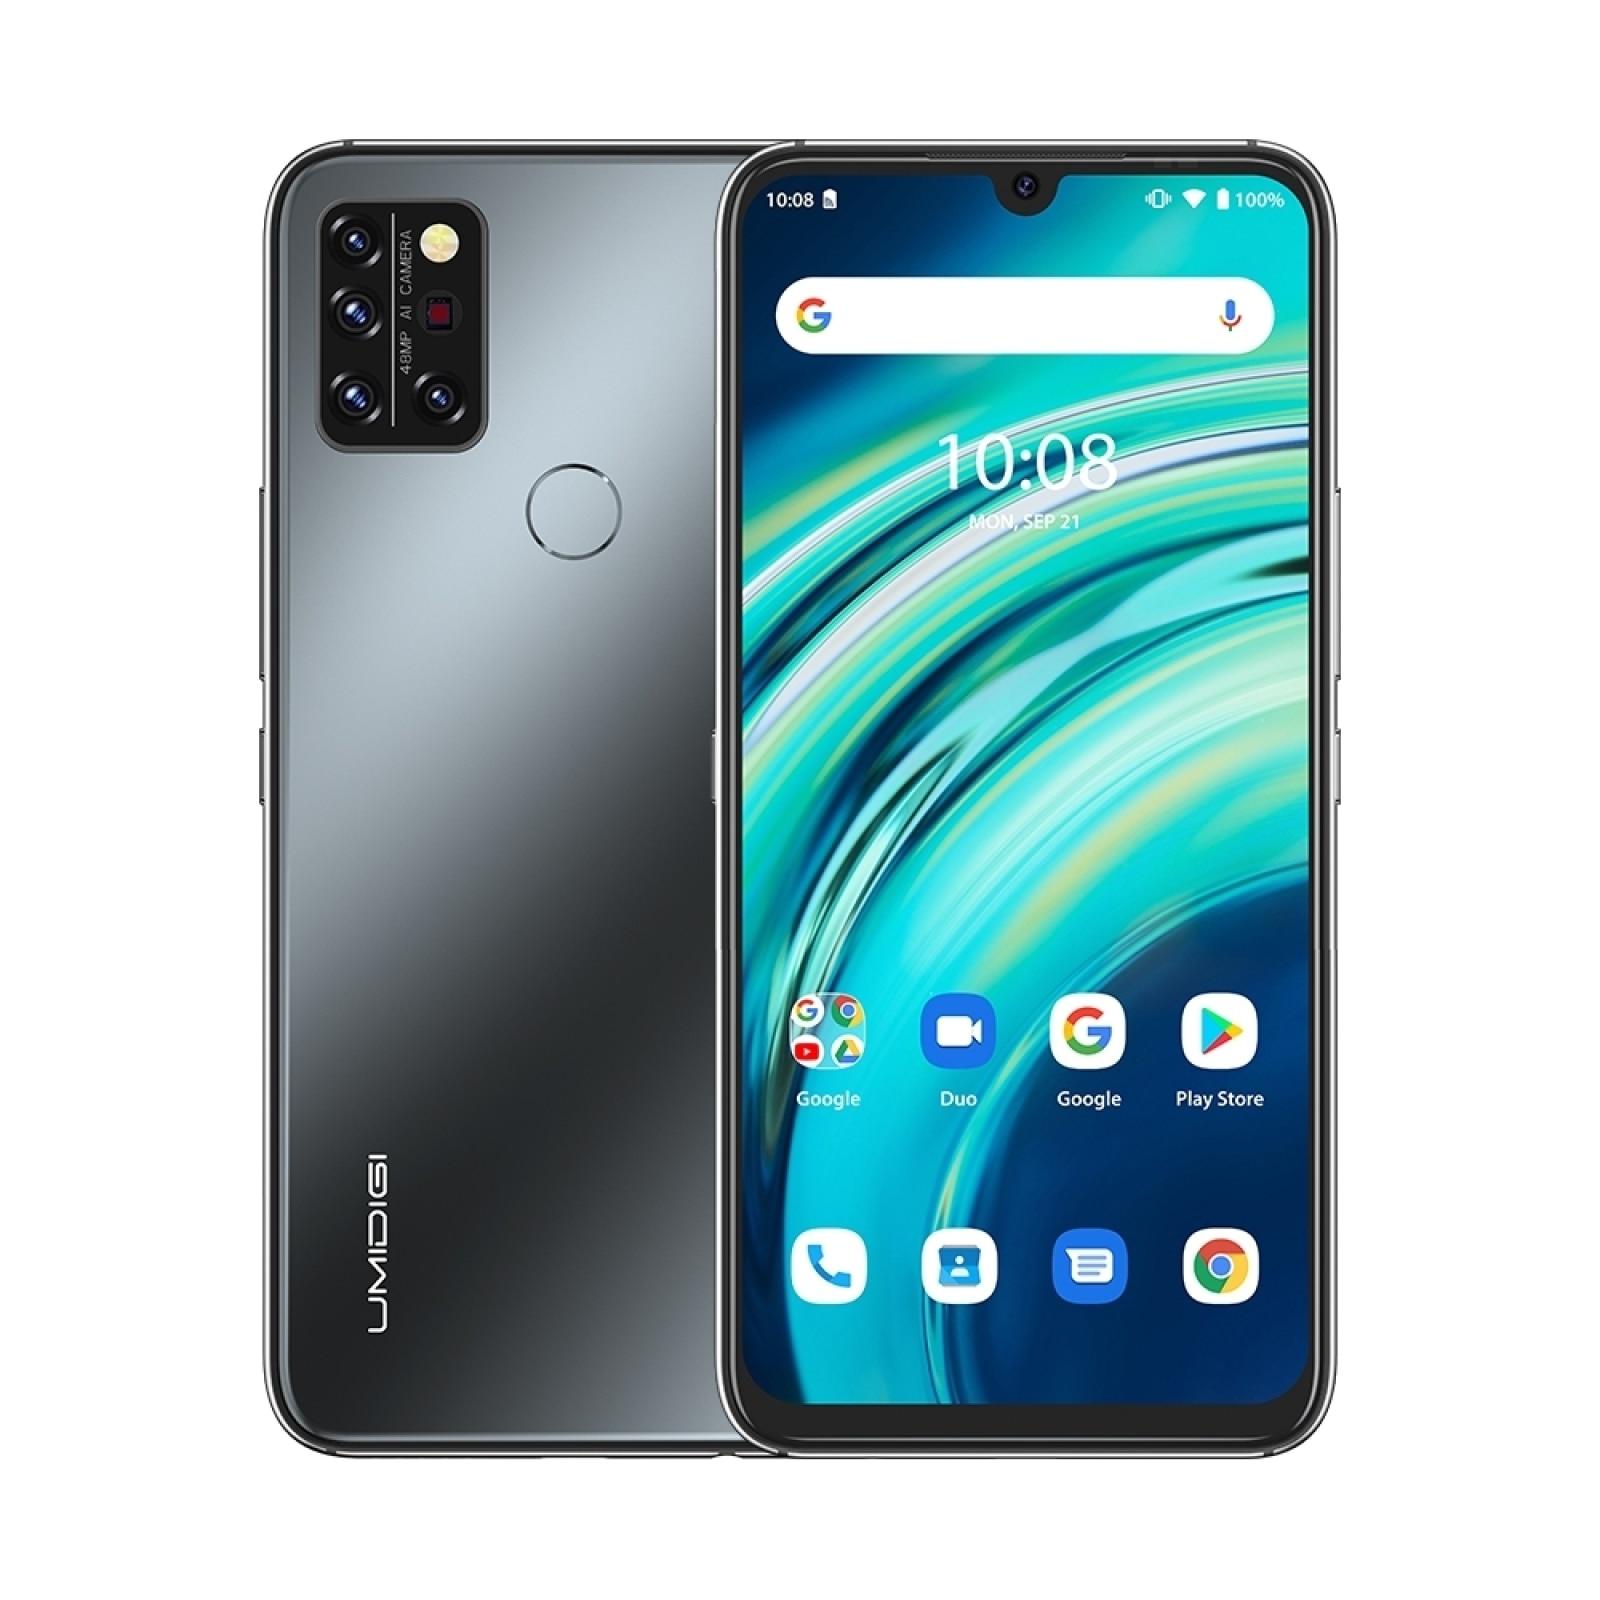 UMIDIGI A9 Pro 32MP Quad Camera Smartphone 4+64GB Android 10 Helio P60 Octa Core 6.3